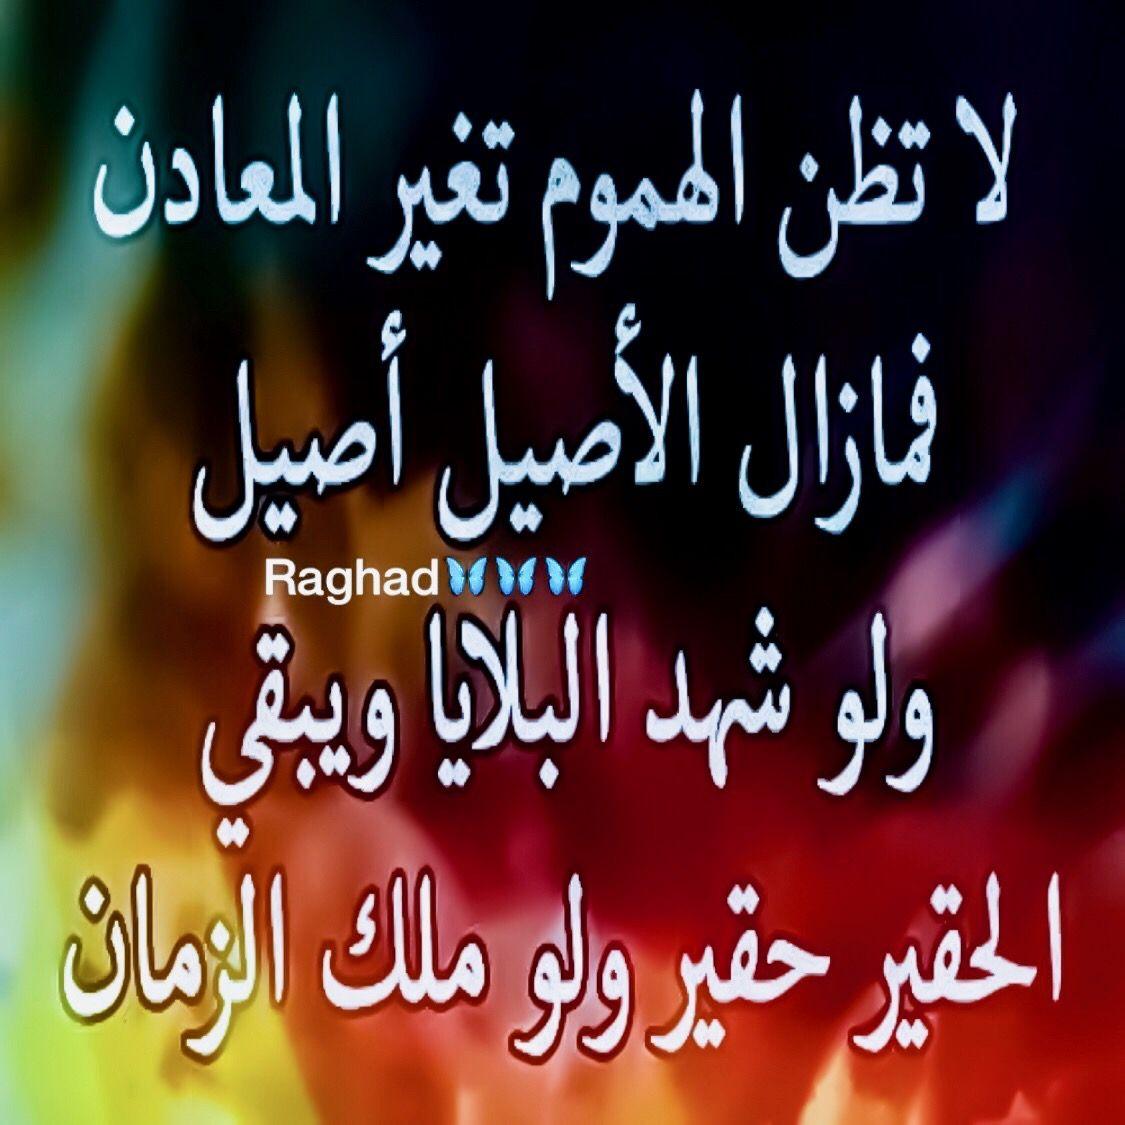 Desertrose ويبقى الأصيل أصيل مهما تغيرت عليه الحياة Words Quotes Arabic Words